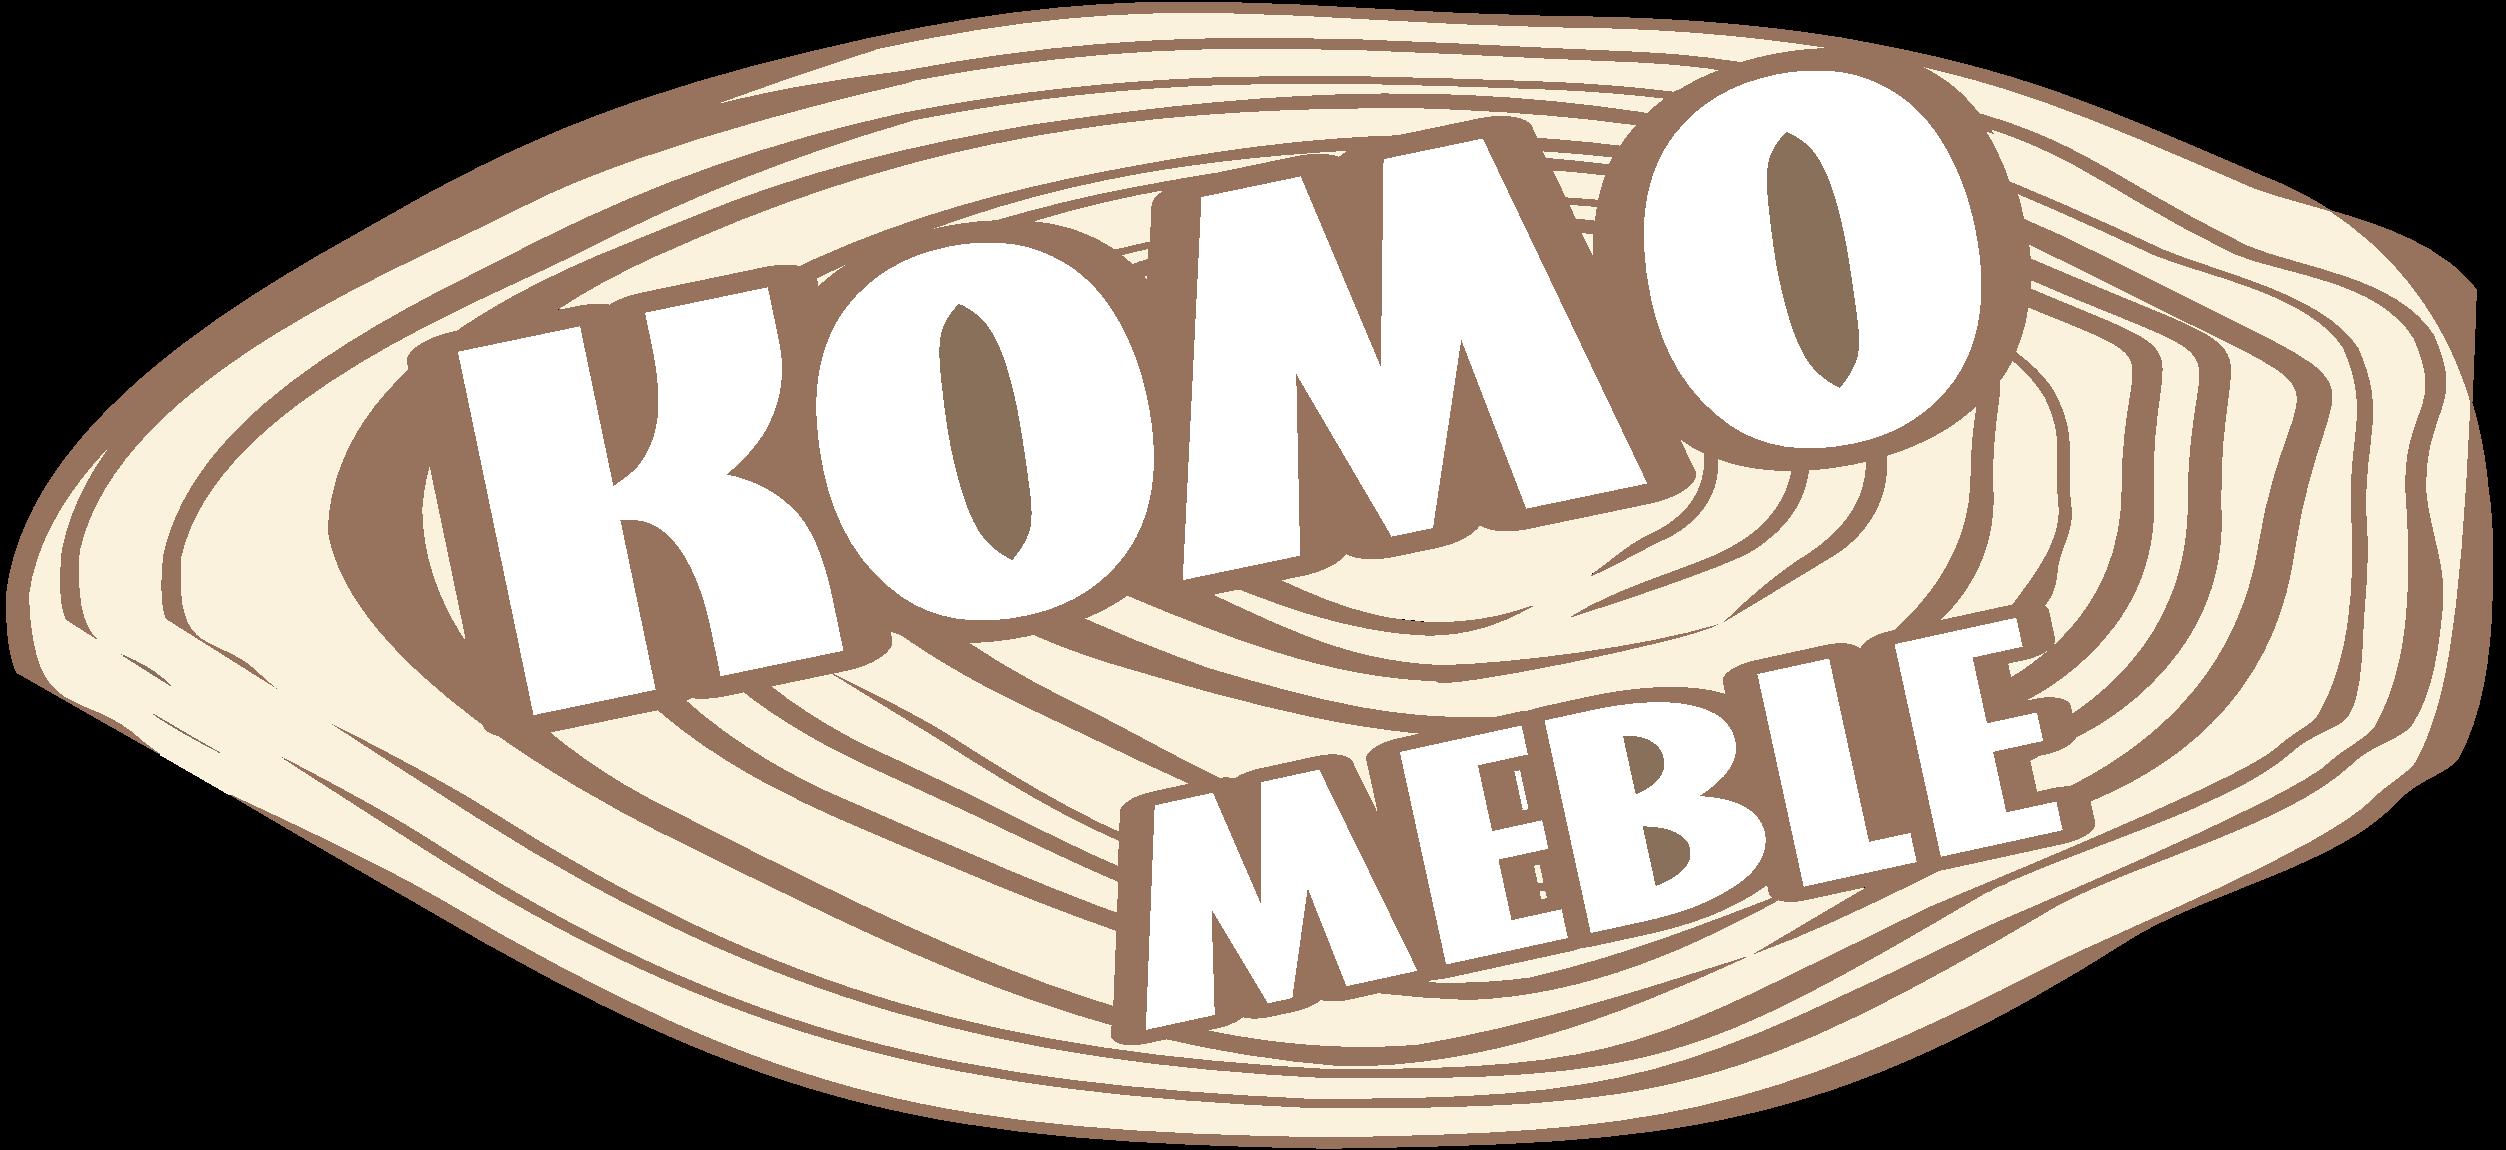 KOMO Meble